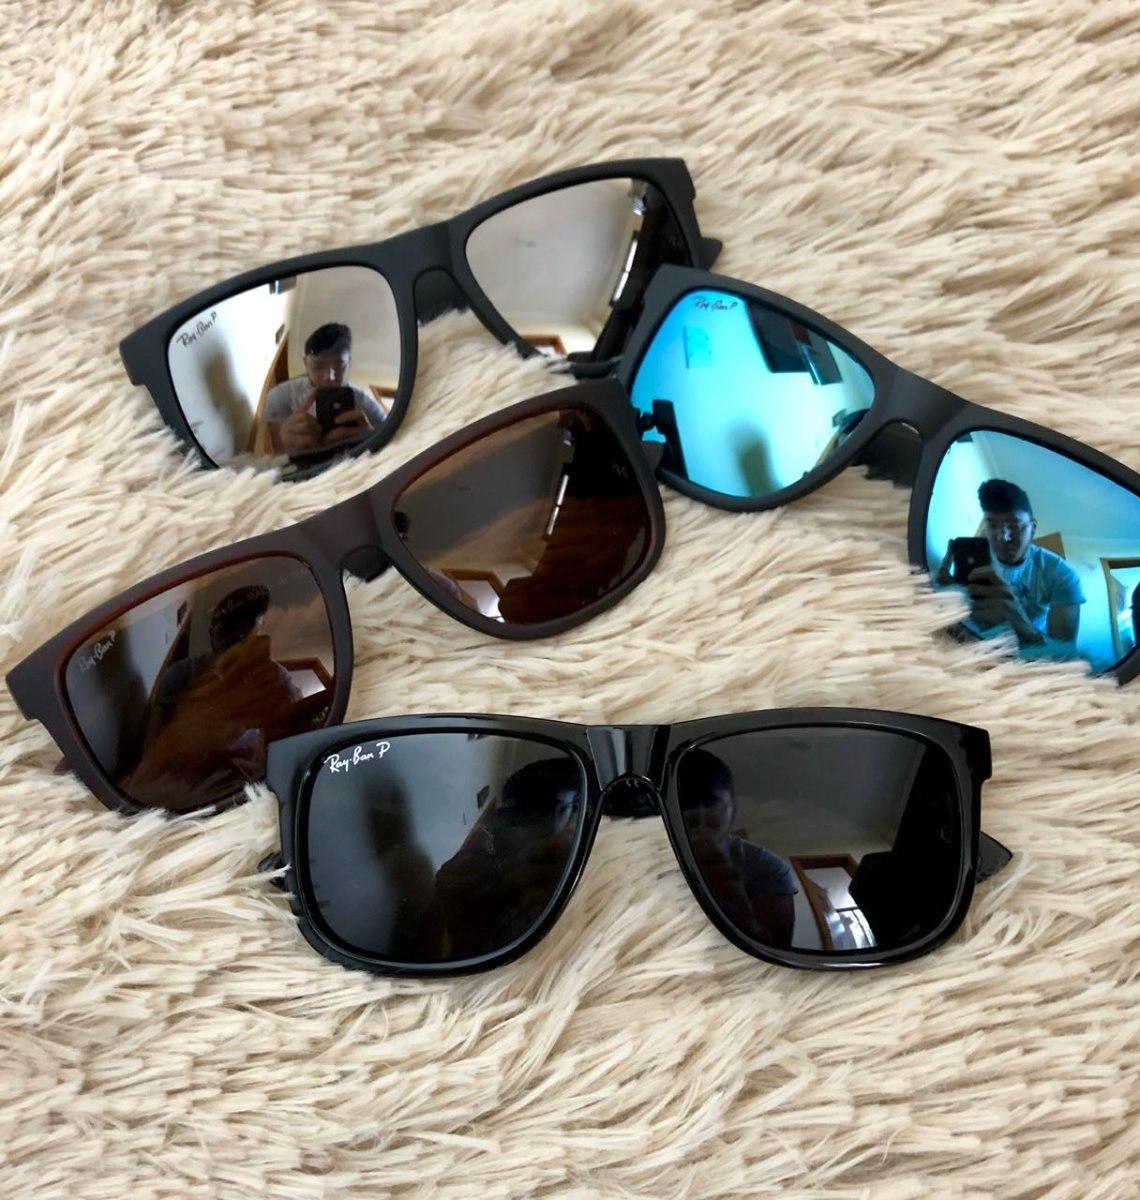 oculos de sol masculino kit com 4 just quadrado preto barato. Carregando  zoom. 2f89c667ab